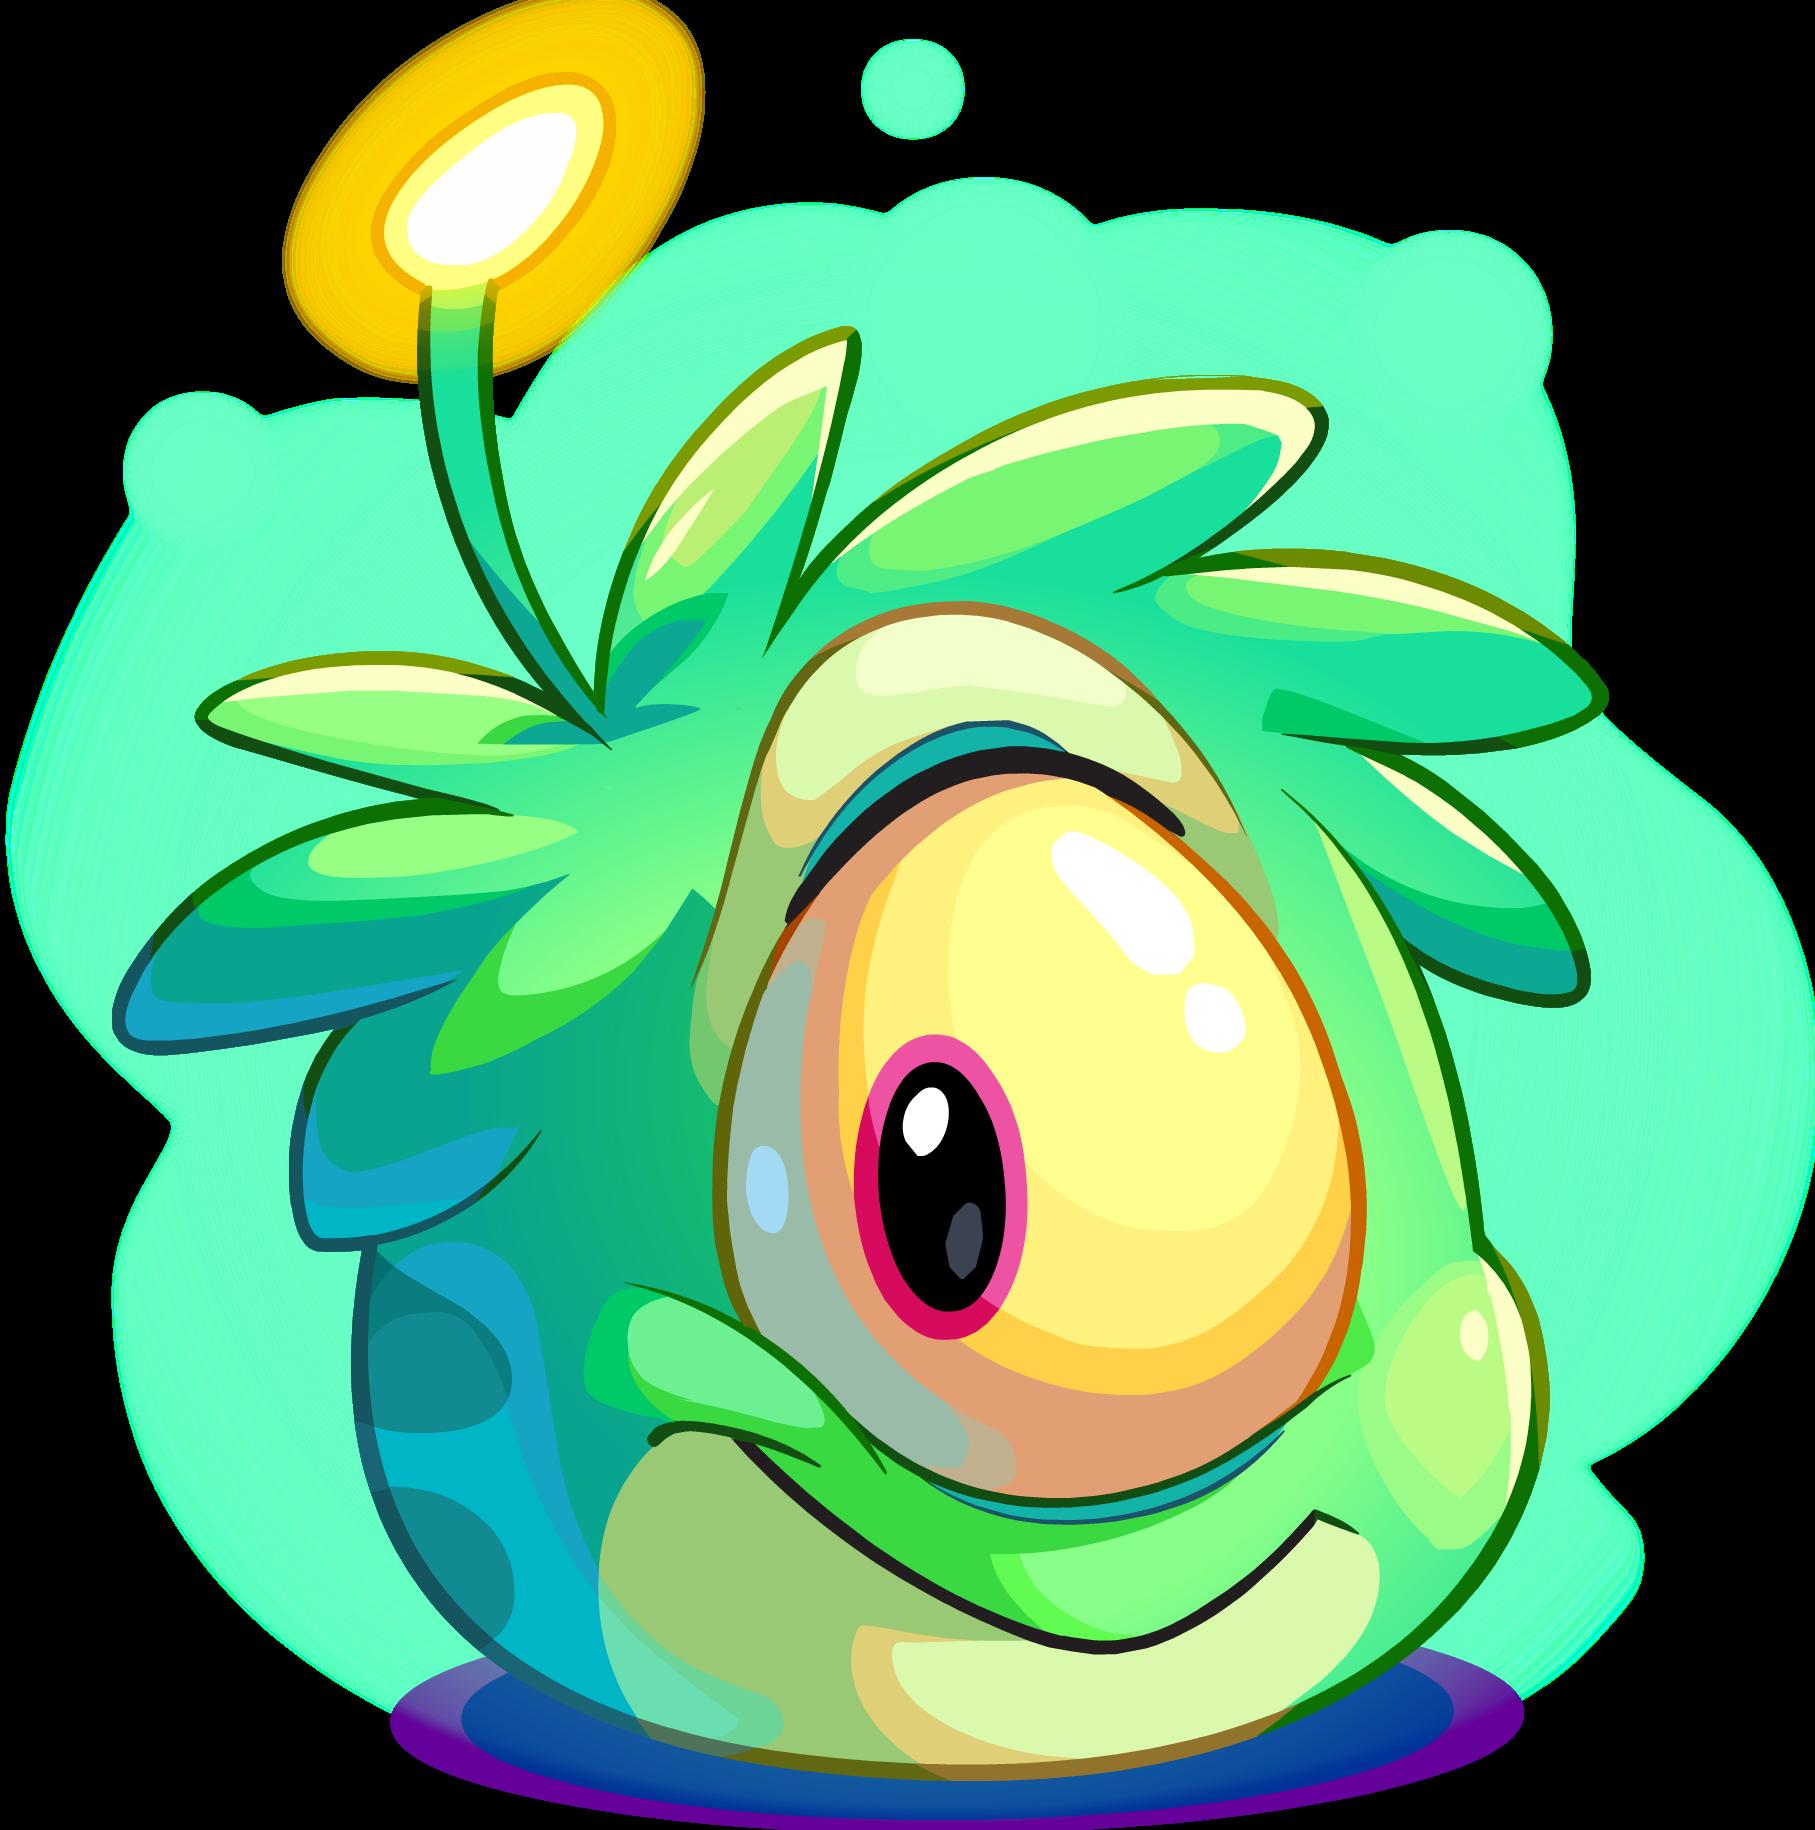 Aliens clipart lime green. Alien puffle club penguin